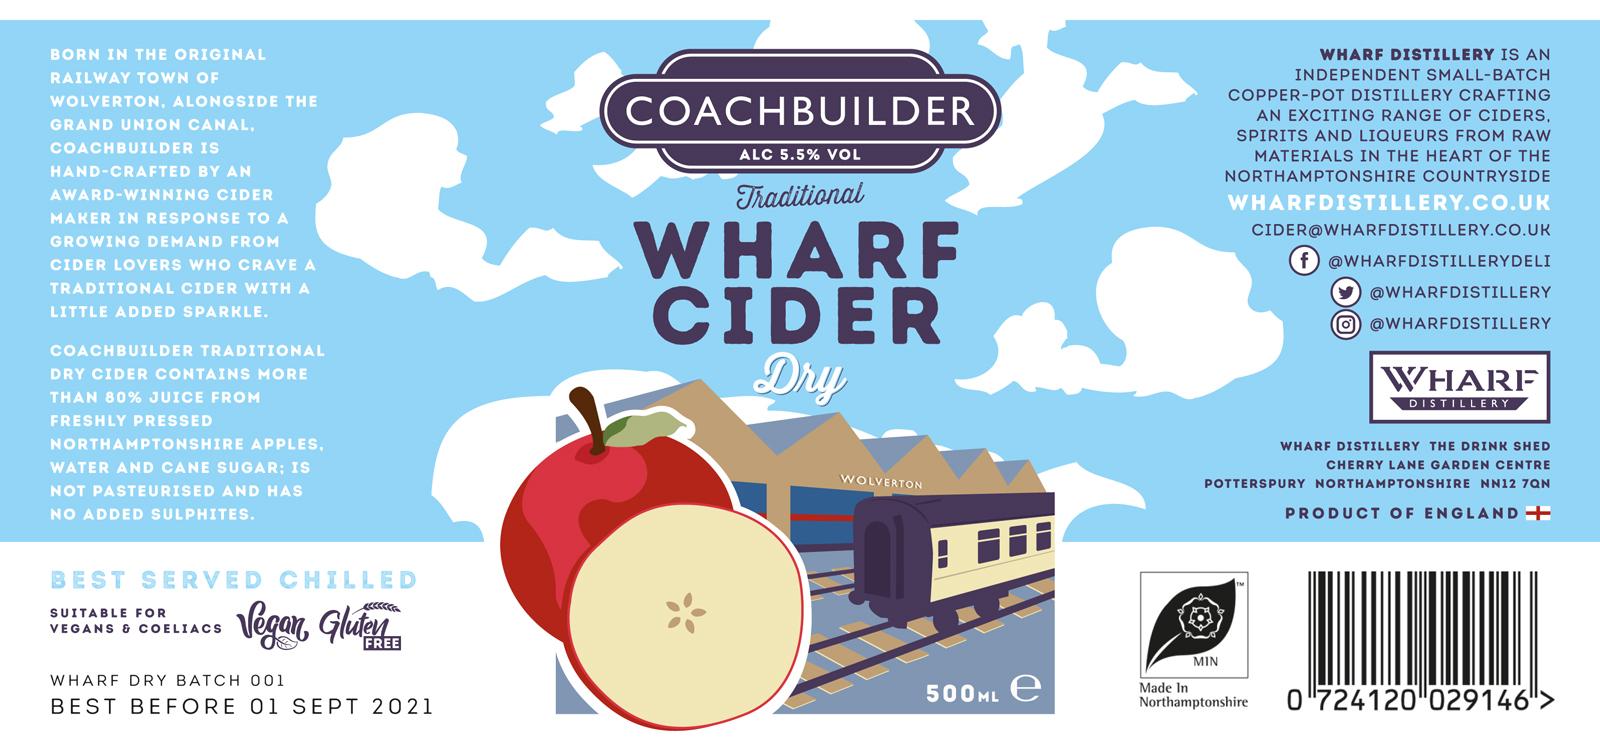 Coachbuilder Cider